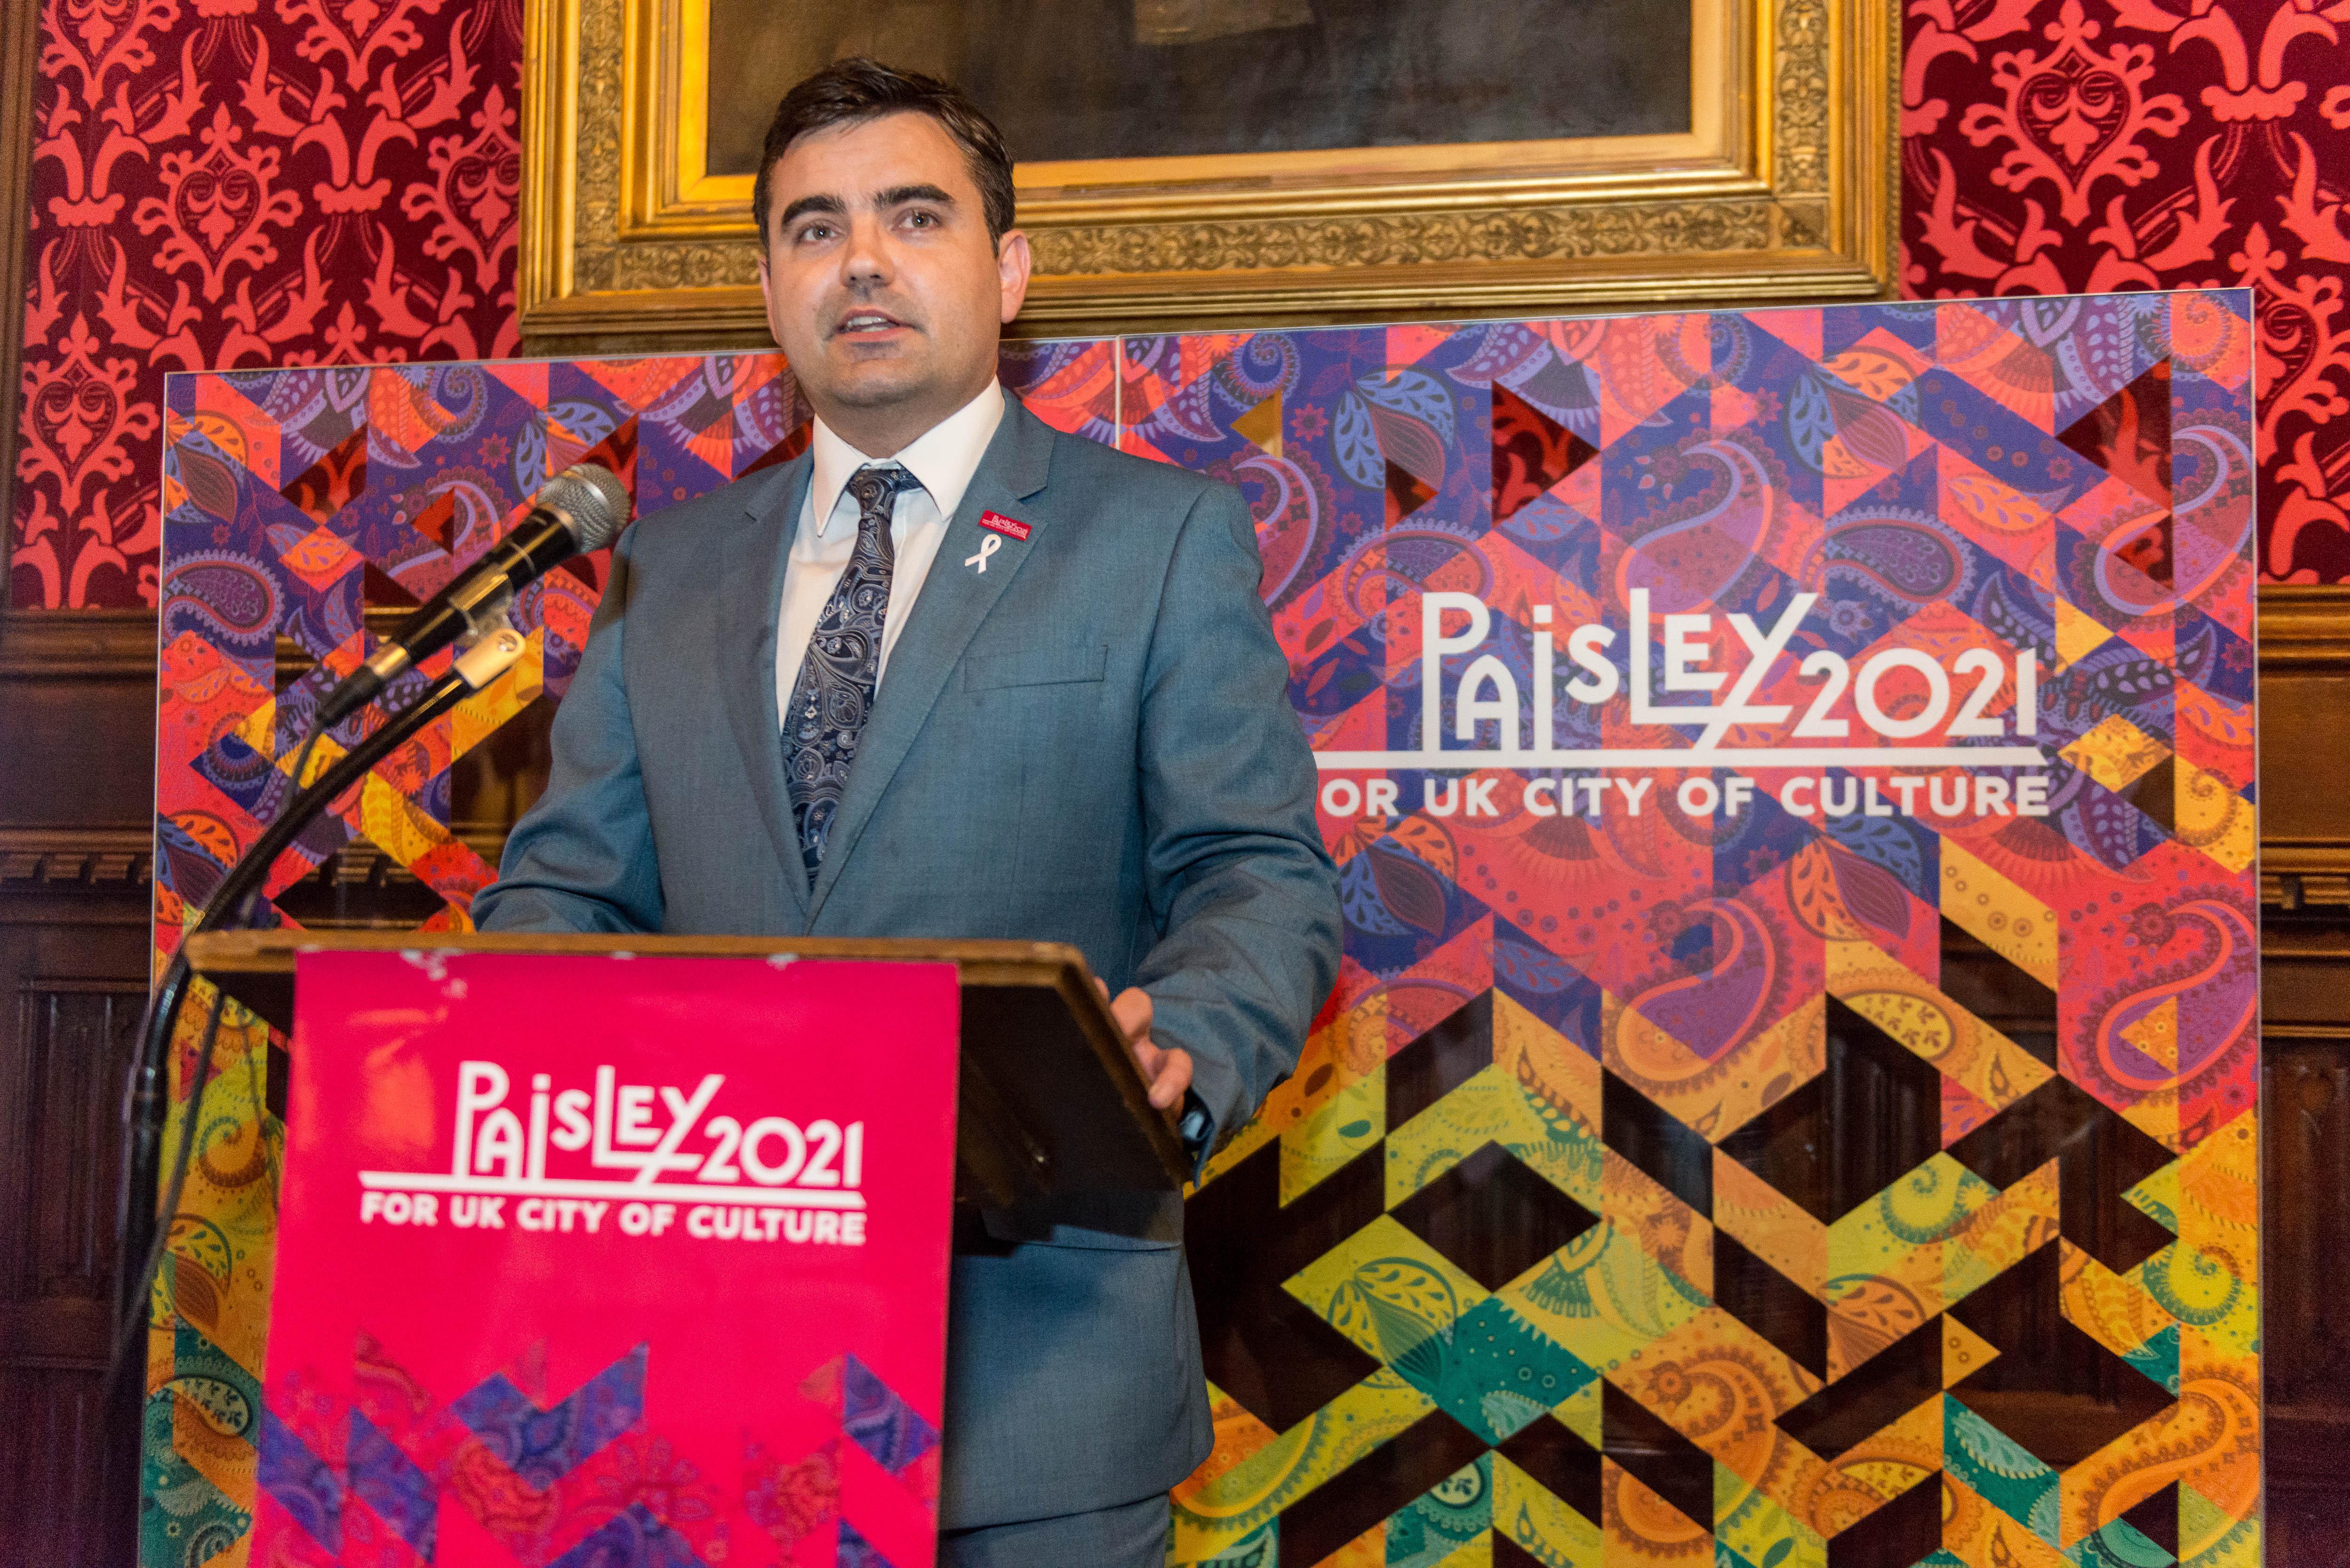 Gavin Newlands on #Paisley2021